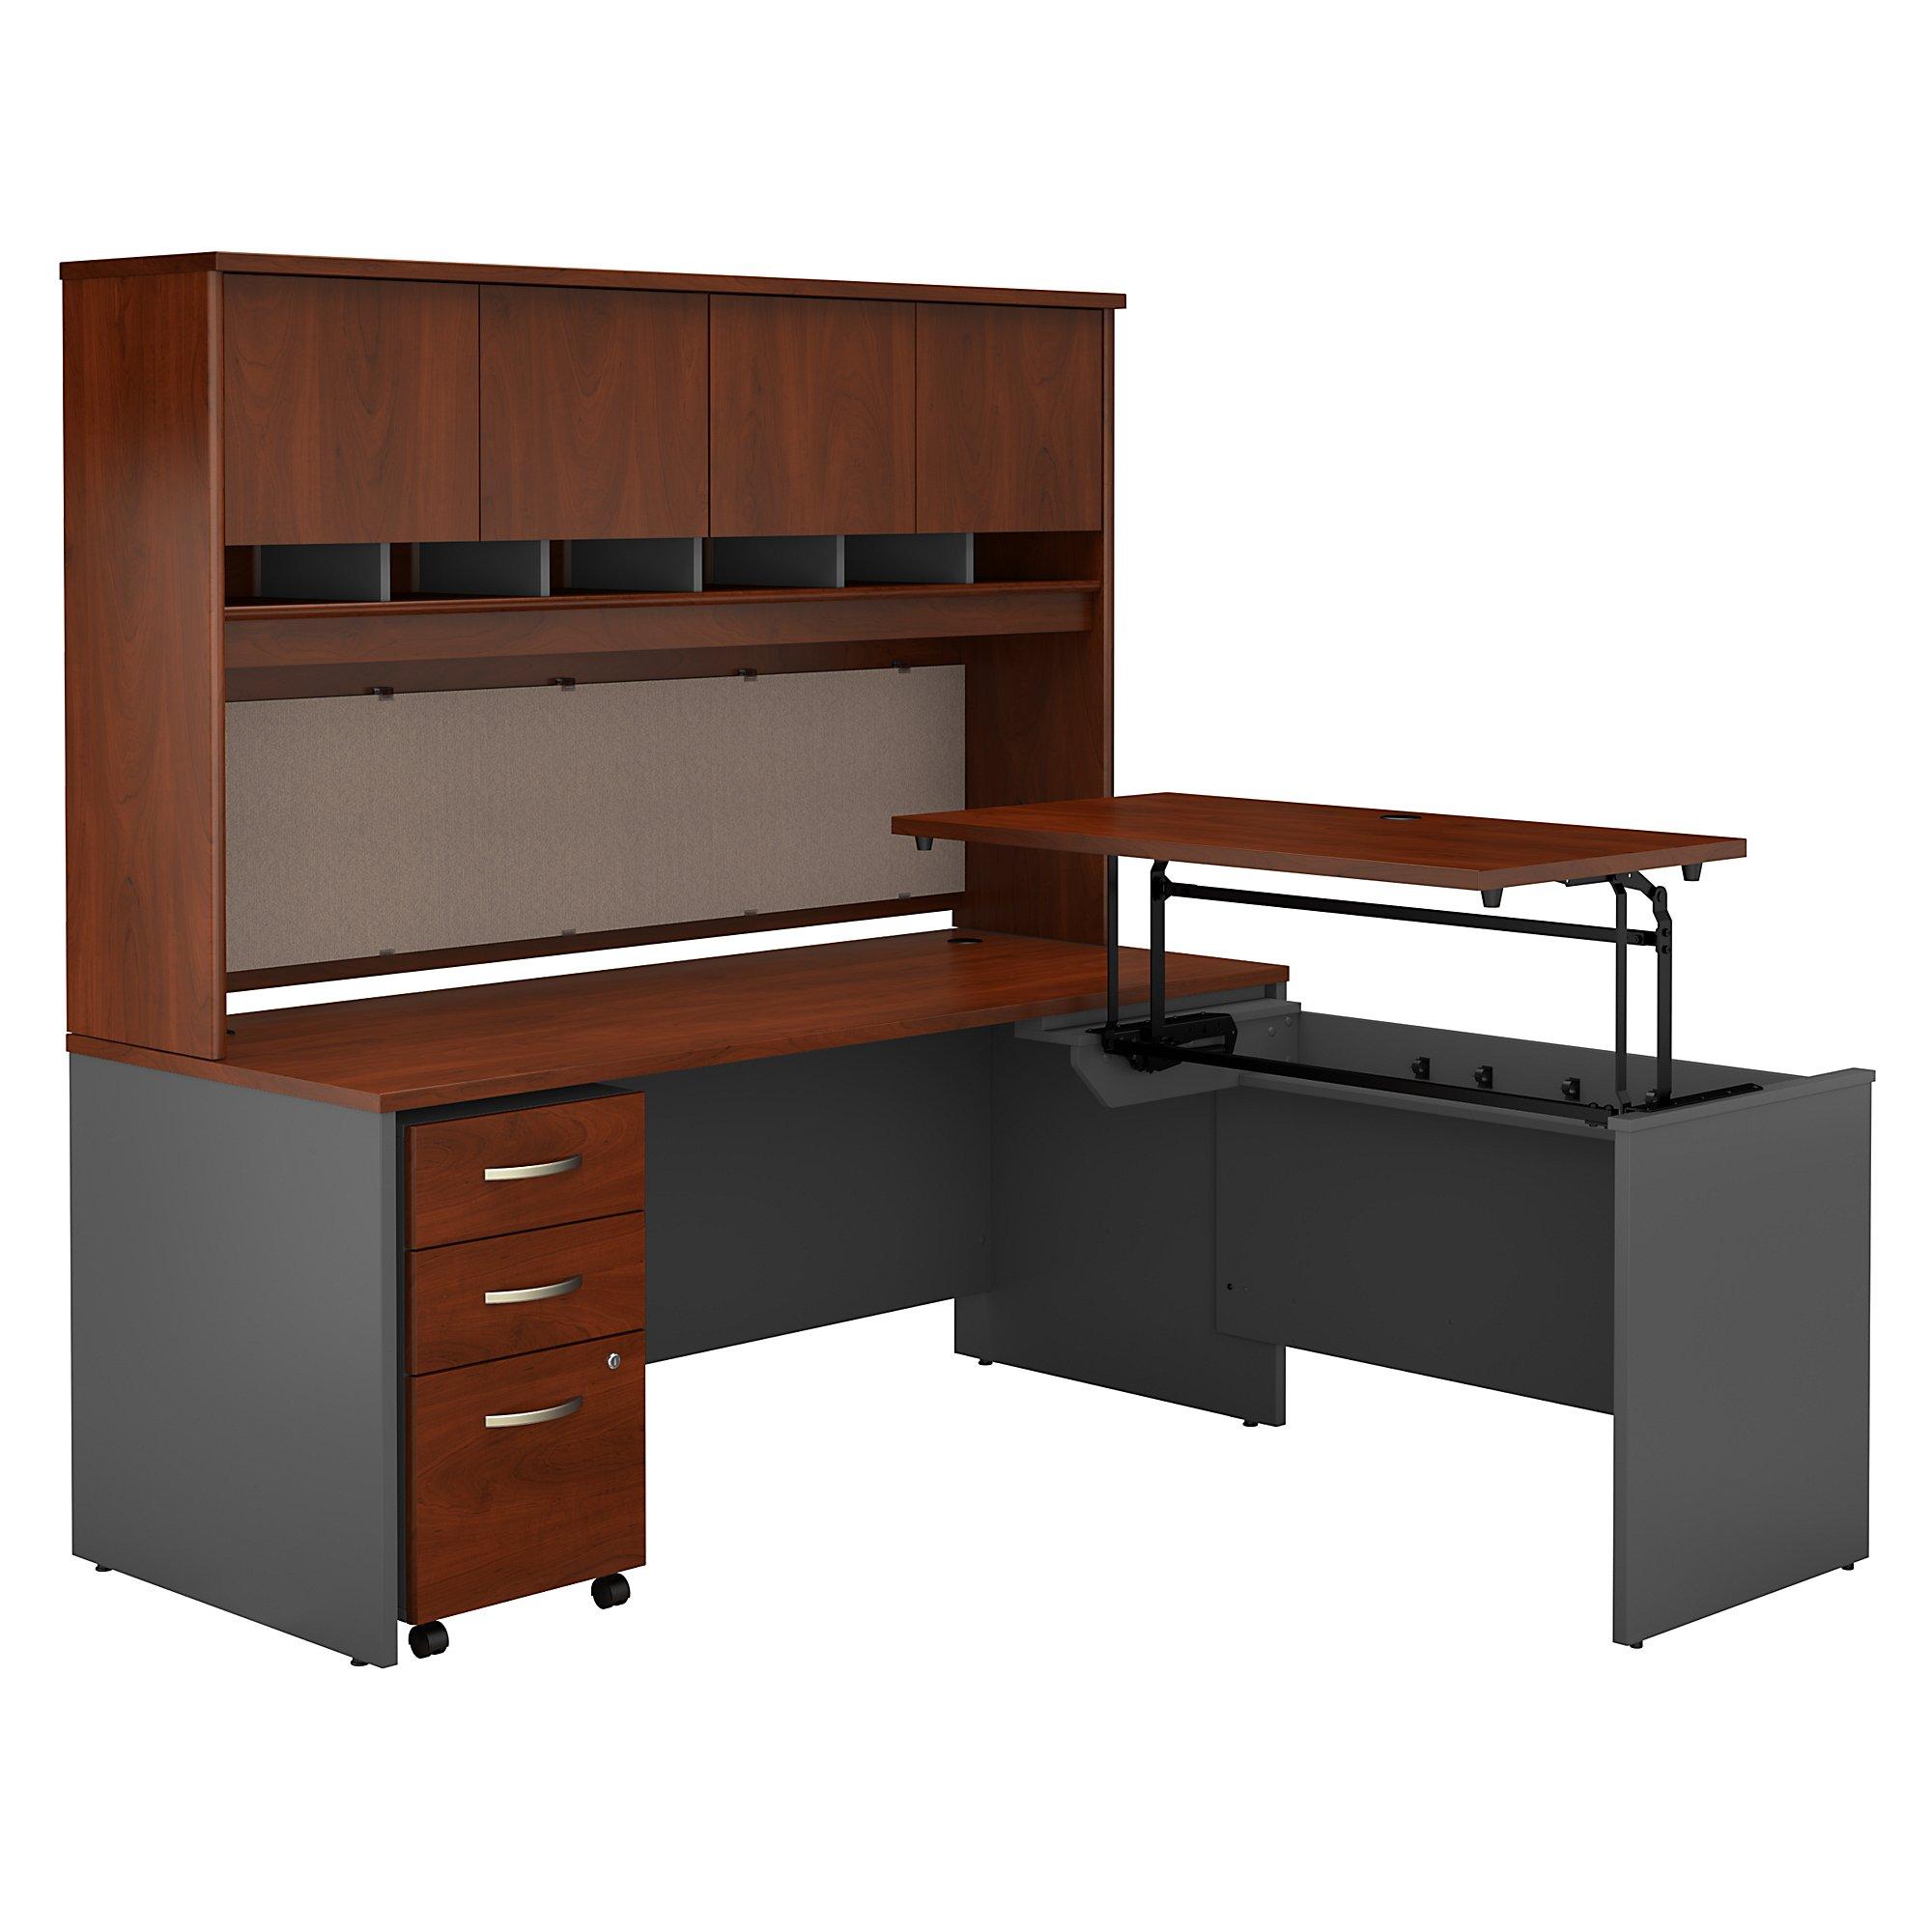 bbf series c l shaped desk with hutch in hansen cherry